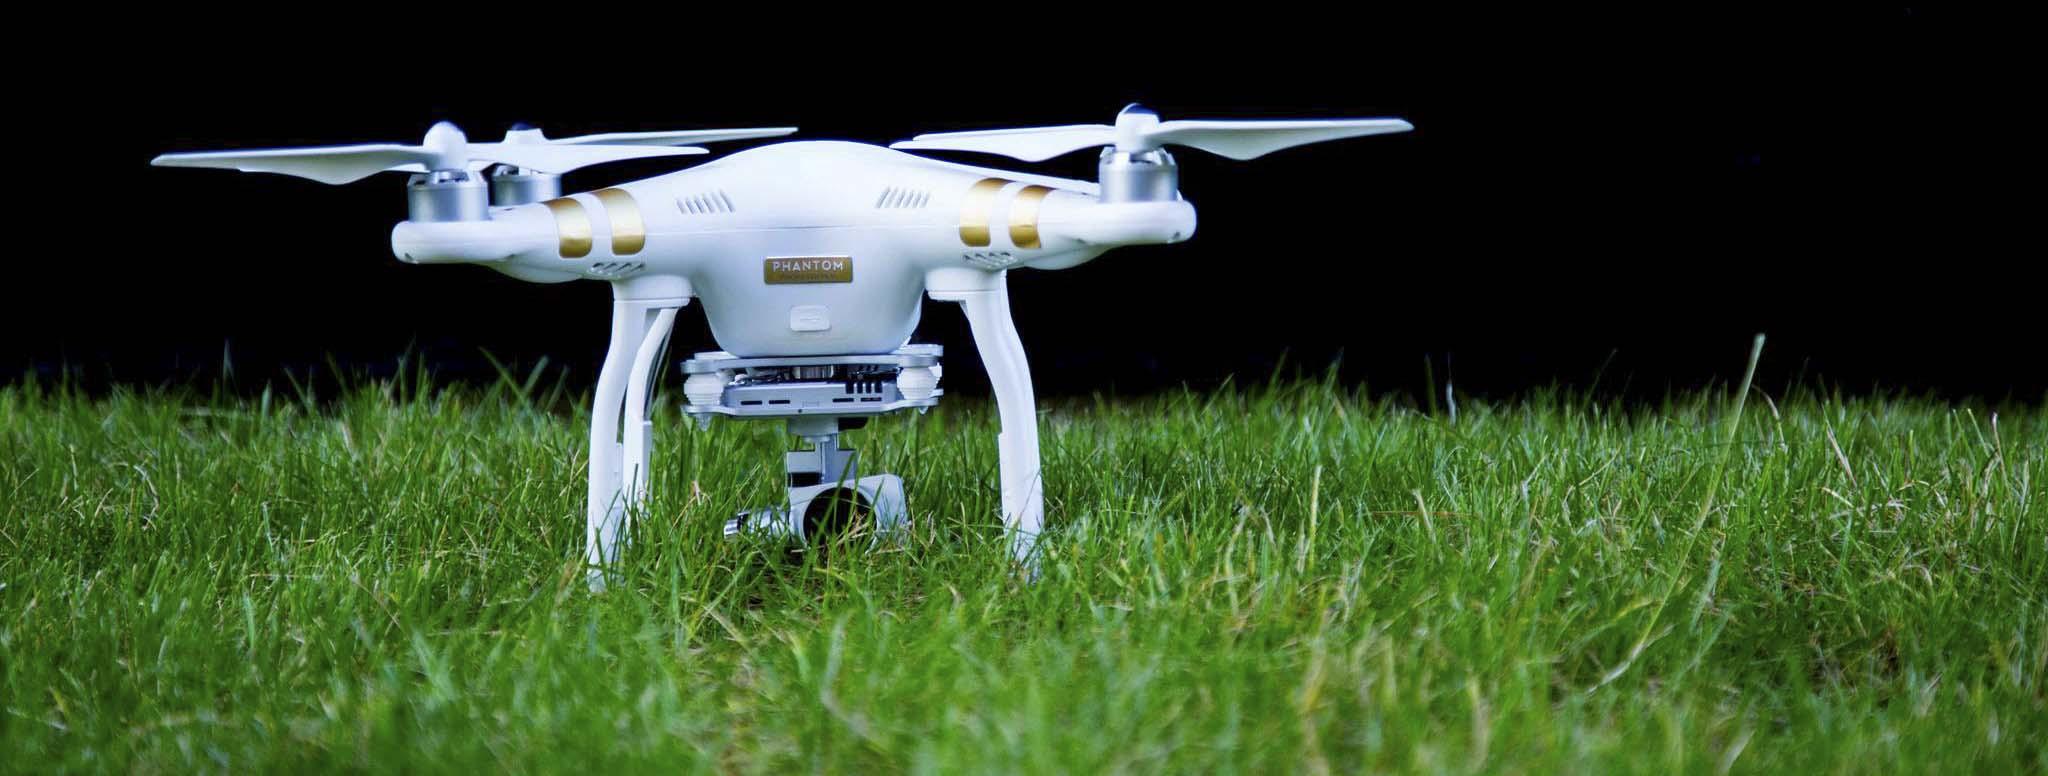 EASY RIDE OPÉRATEUR DRONE EN BRETAGNE